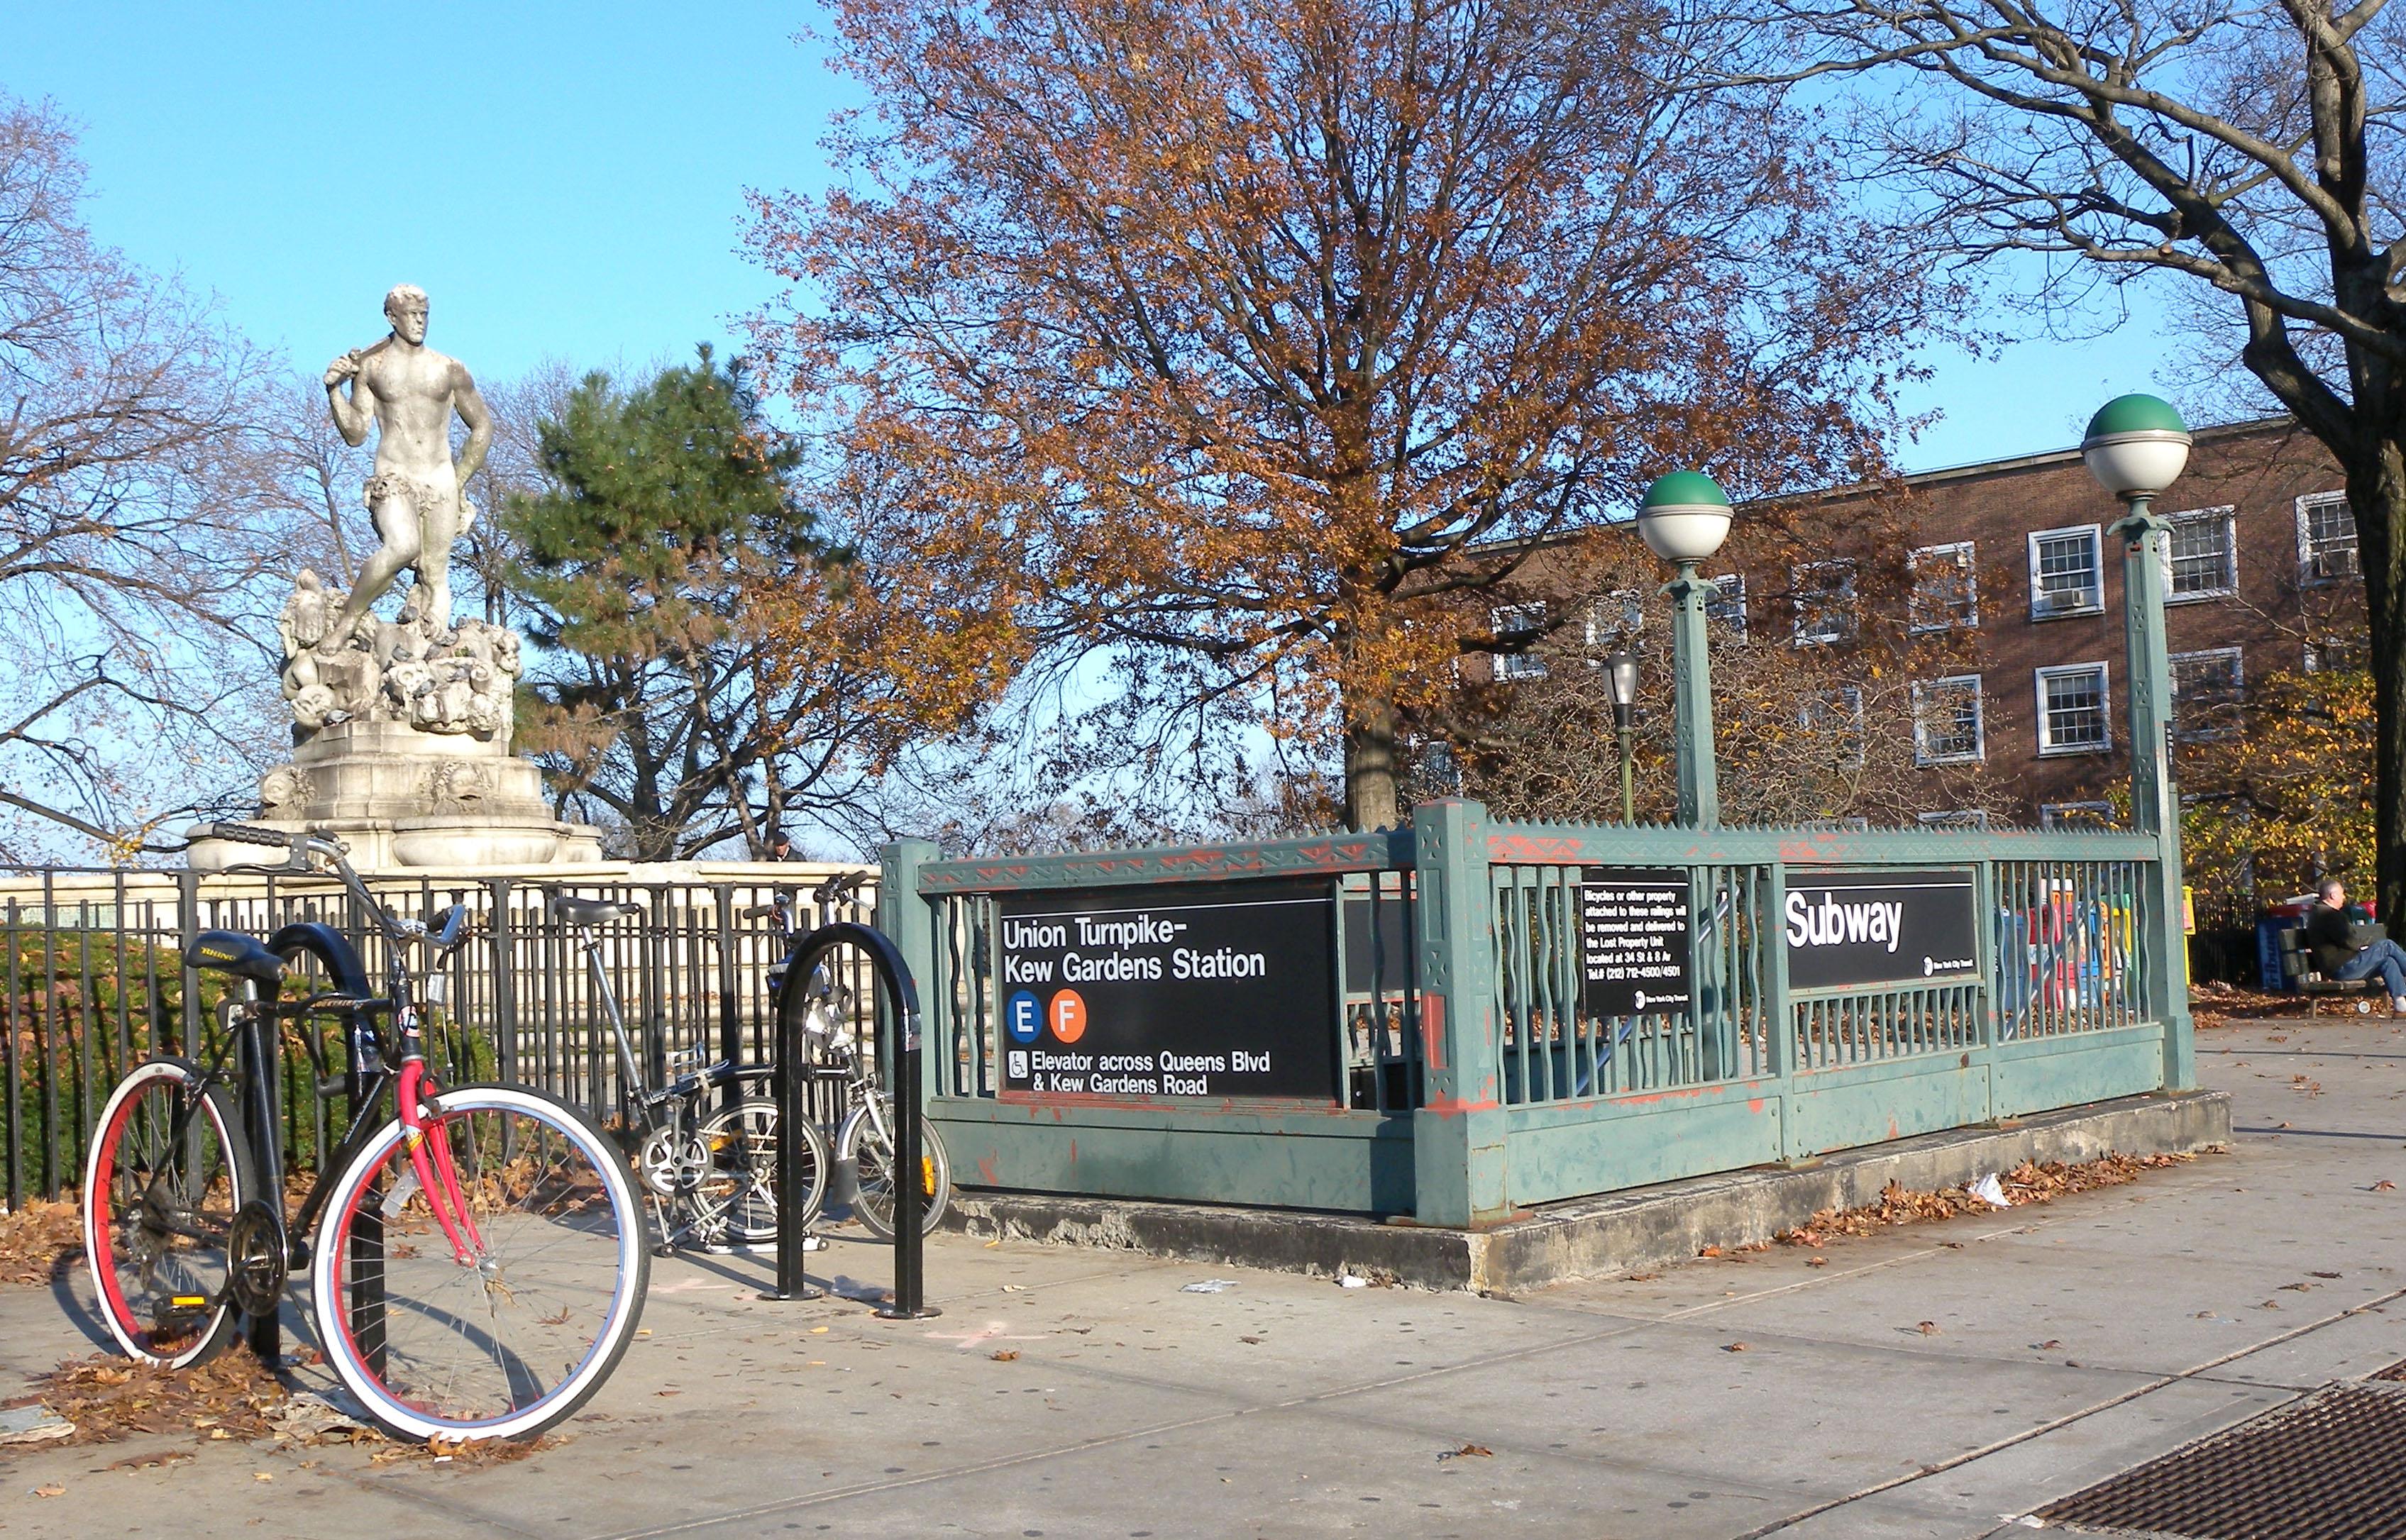 Kew Gardens Union Turnpike Urban Transit Project